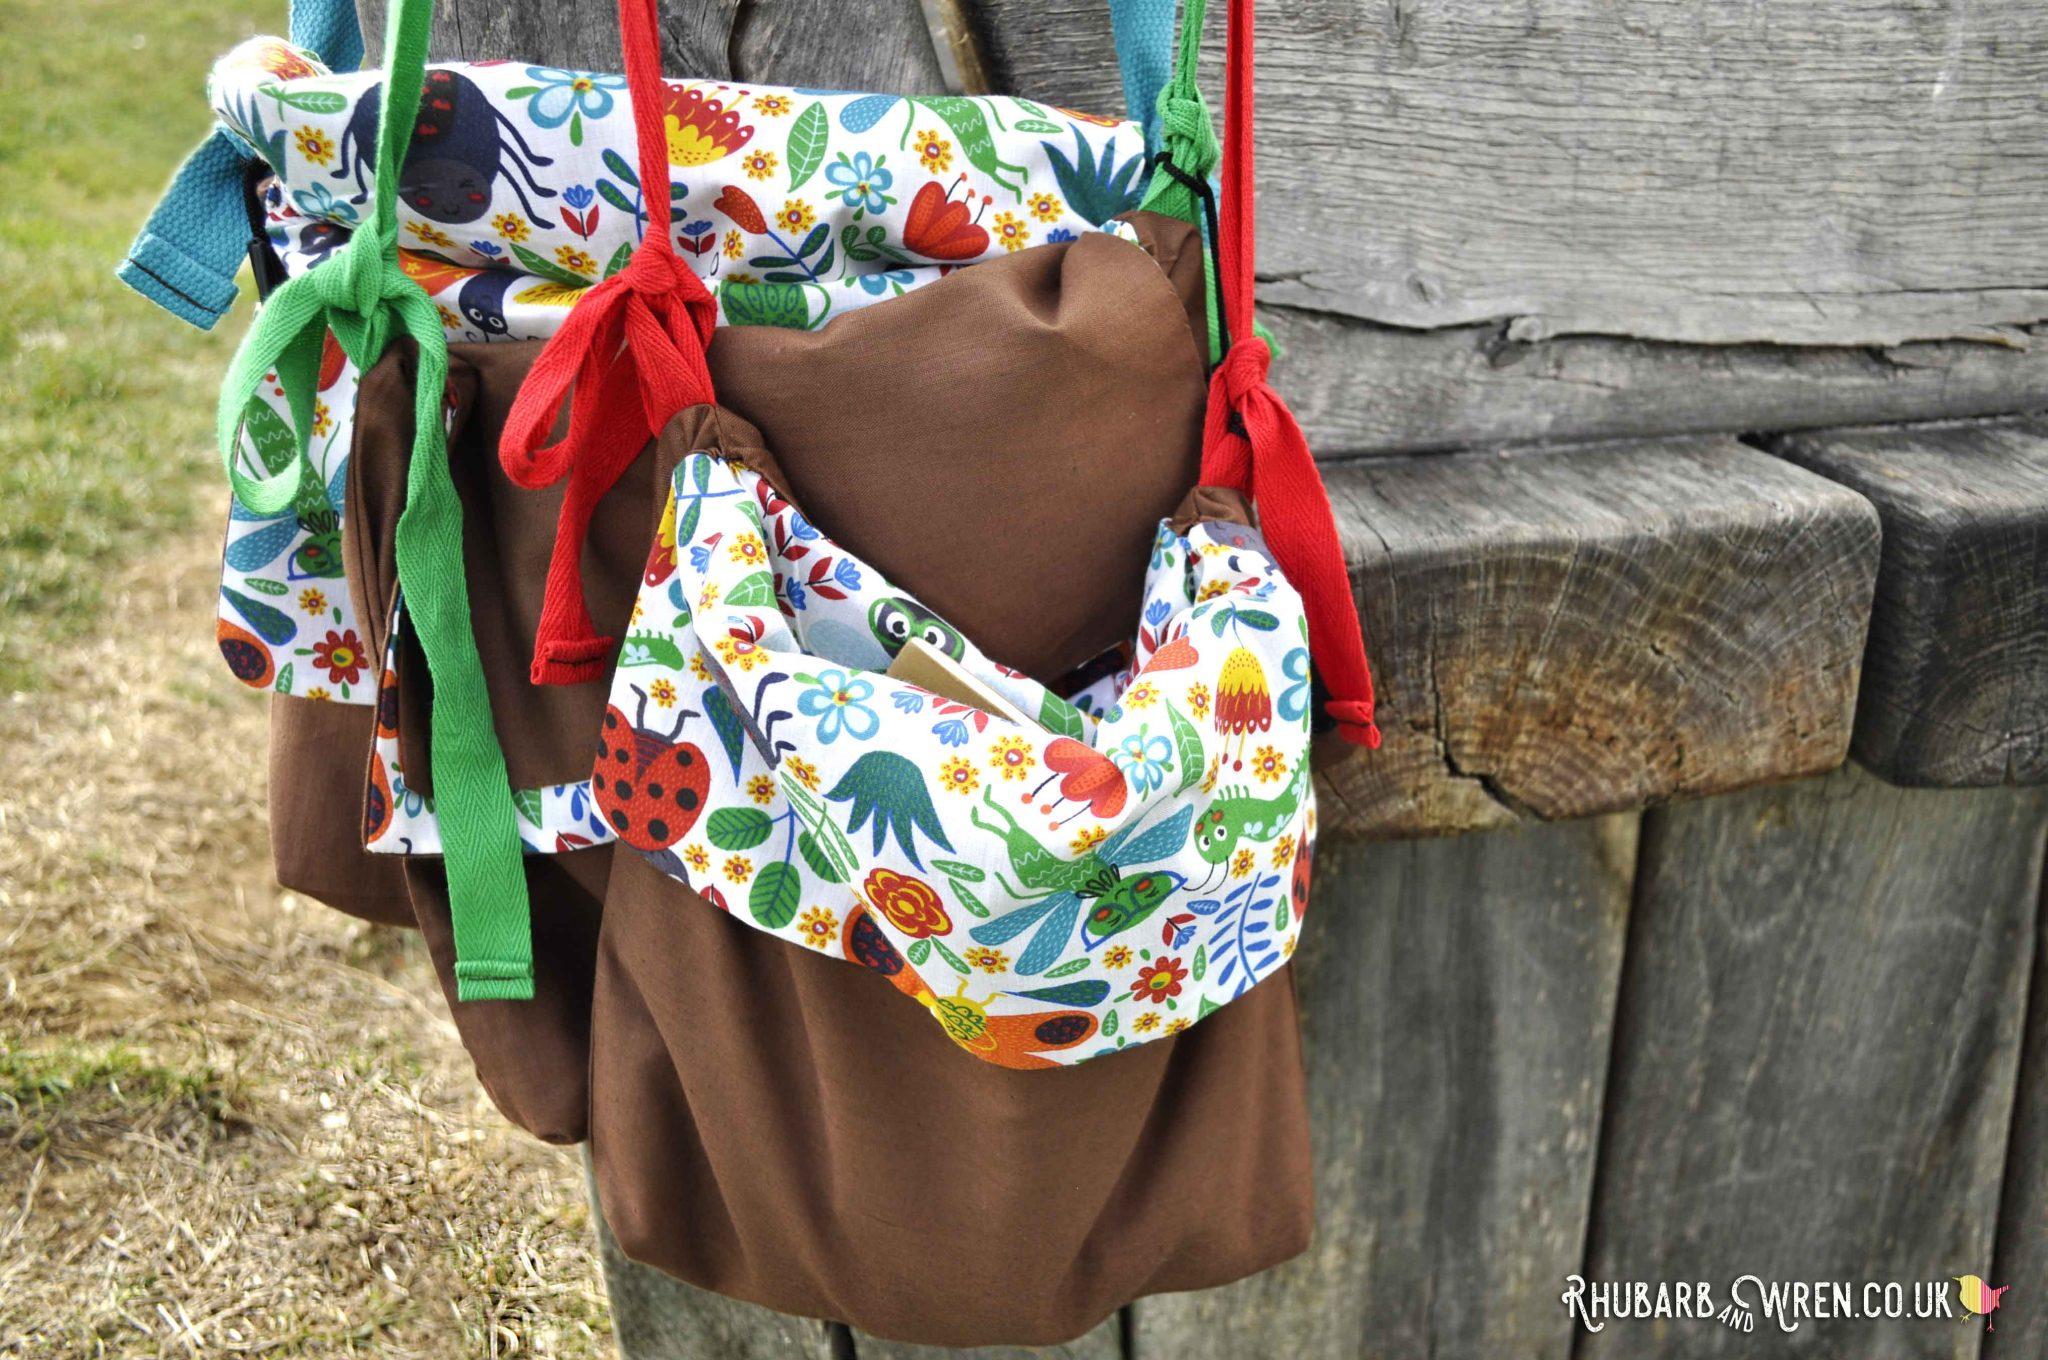 DIY kids nature explorer bags - simple sewing project